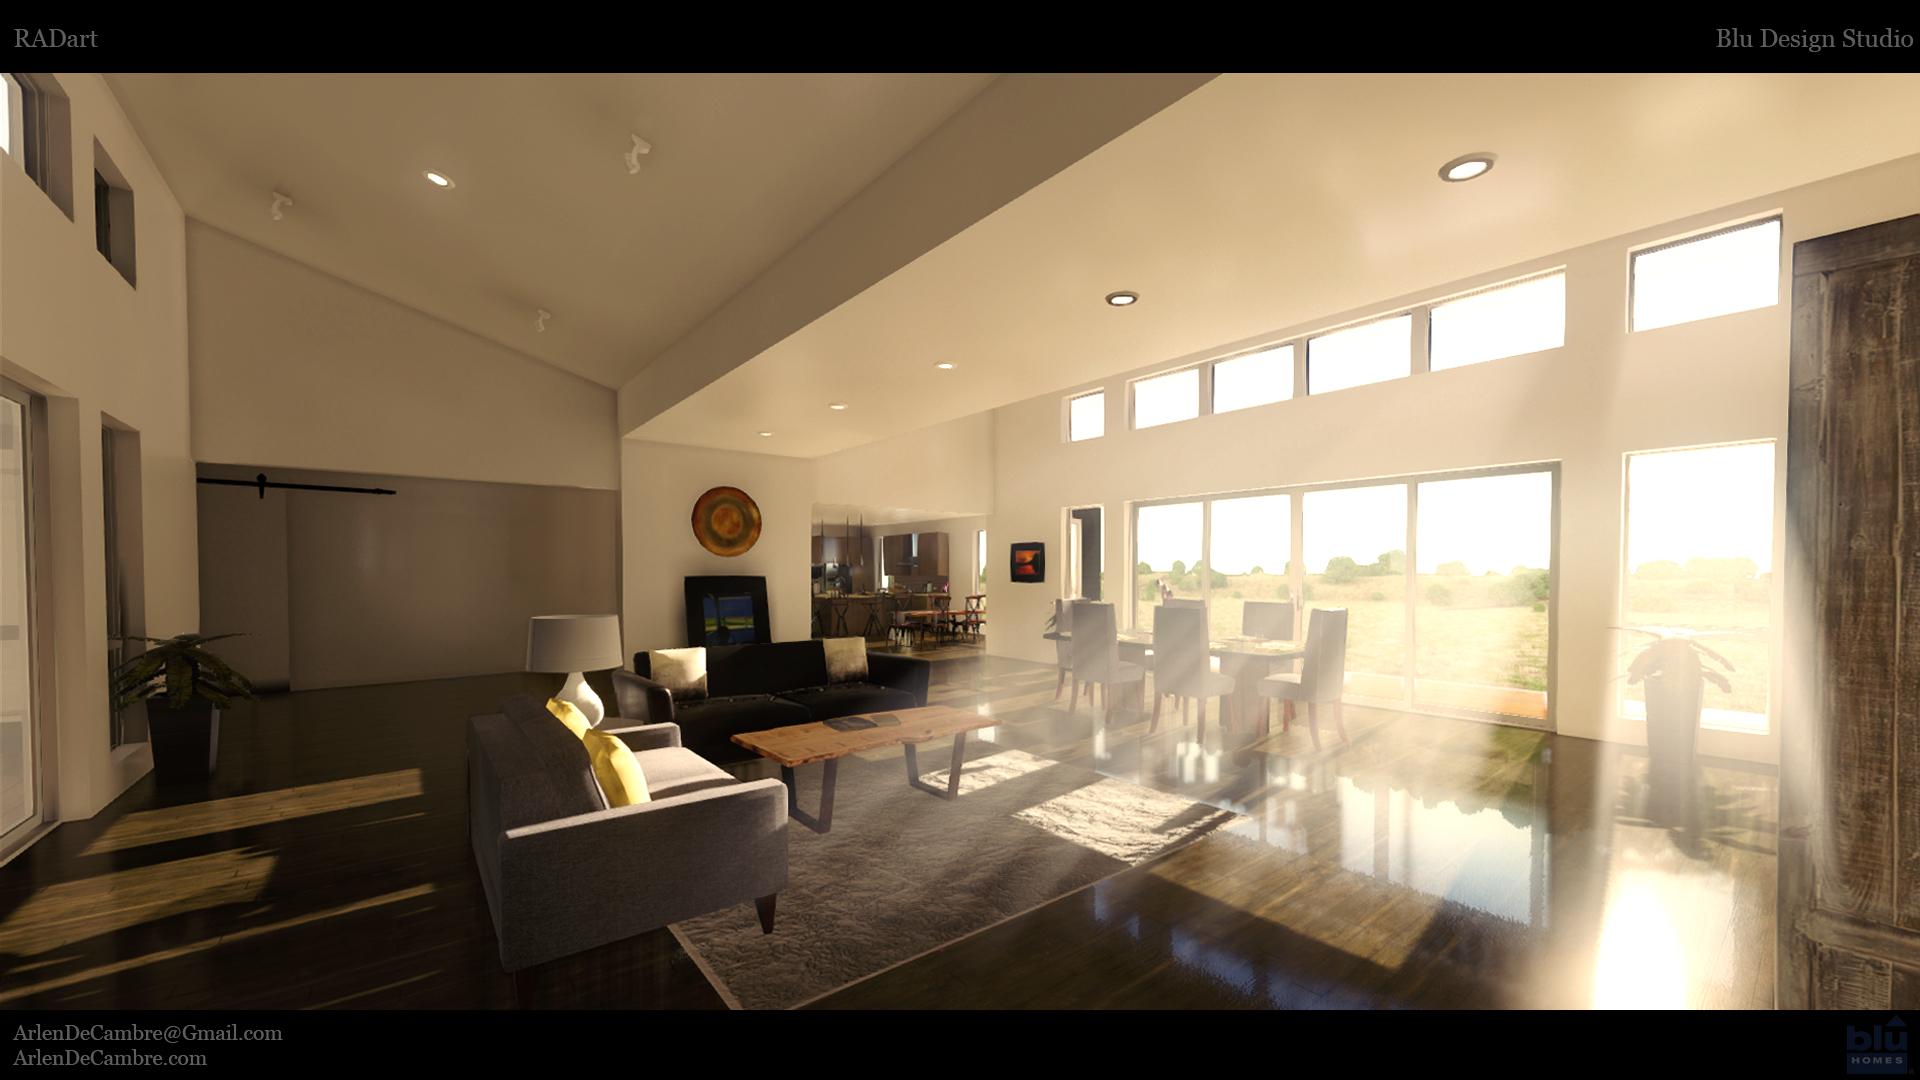 Interior Design with Unity - Unity Forum